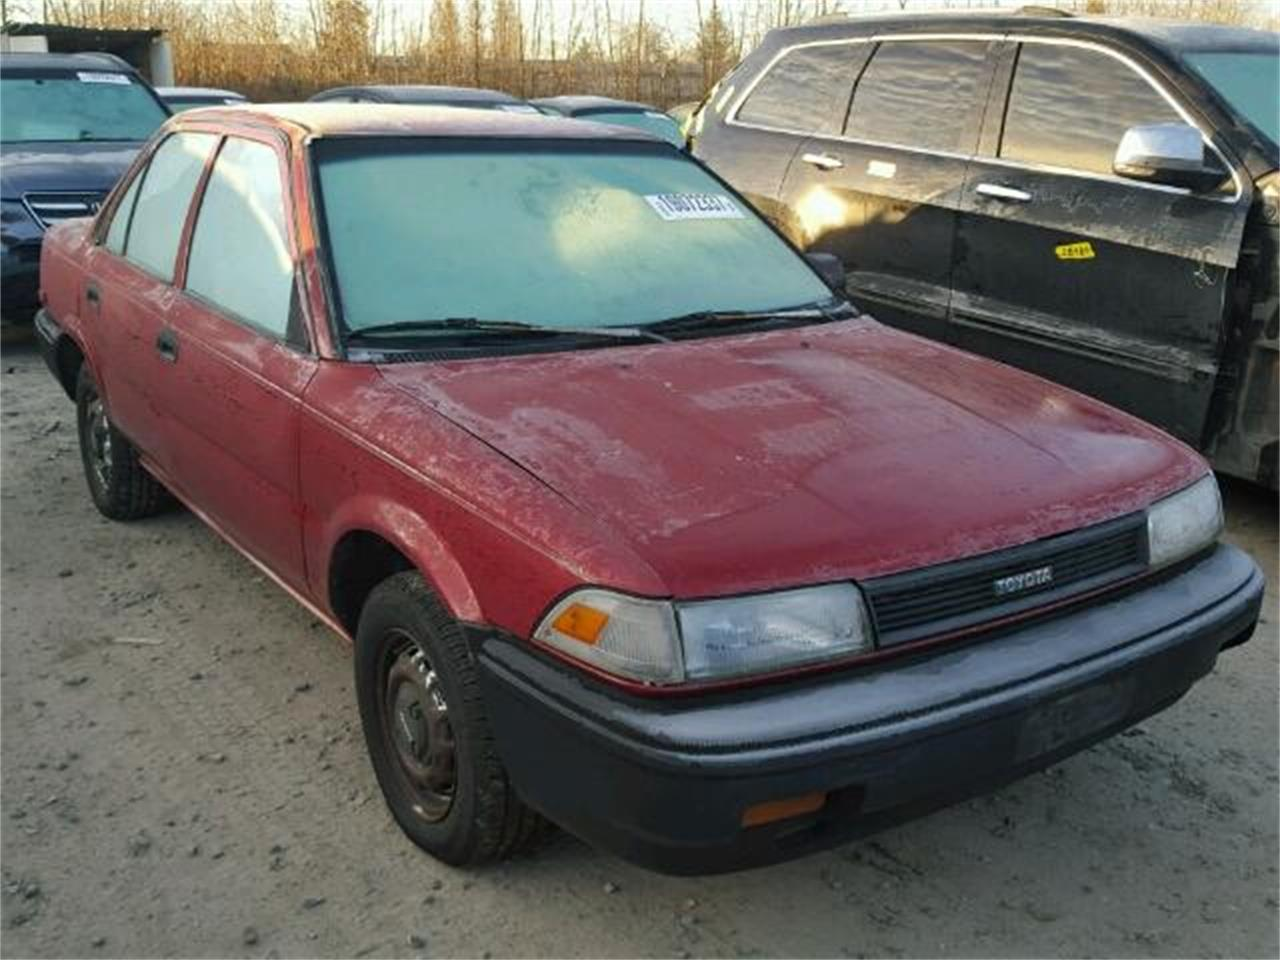 1990 toyota corolla for sale classiccars com cc 948030 1990 toyota corolla for sale